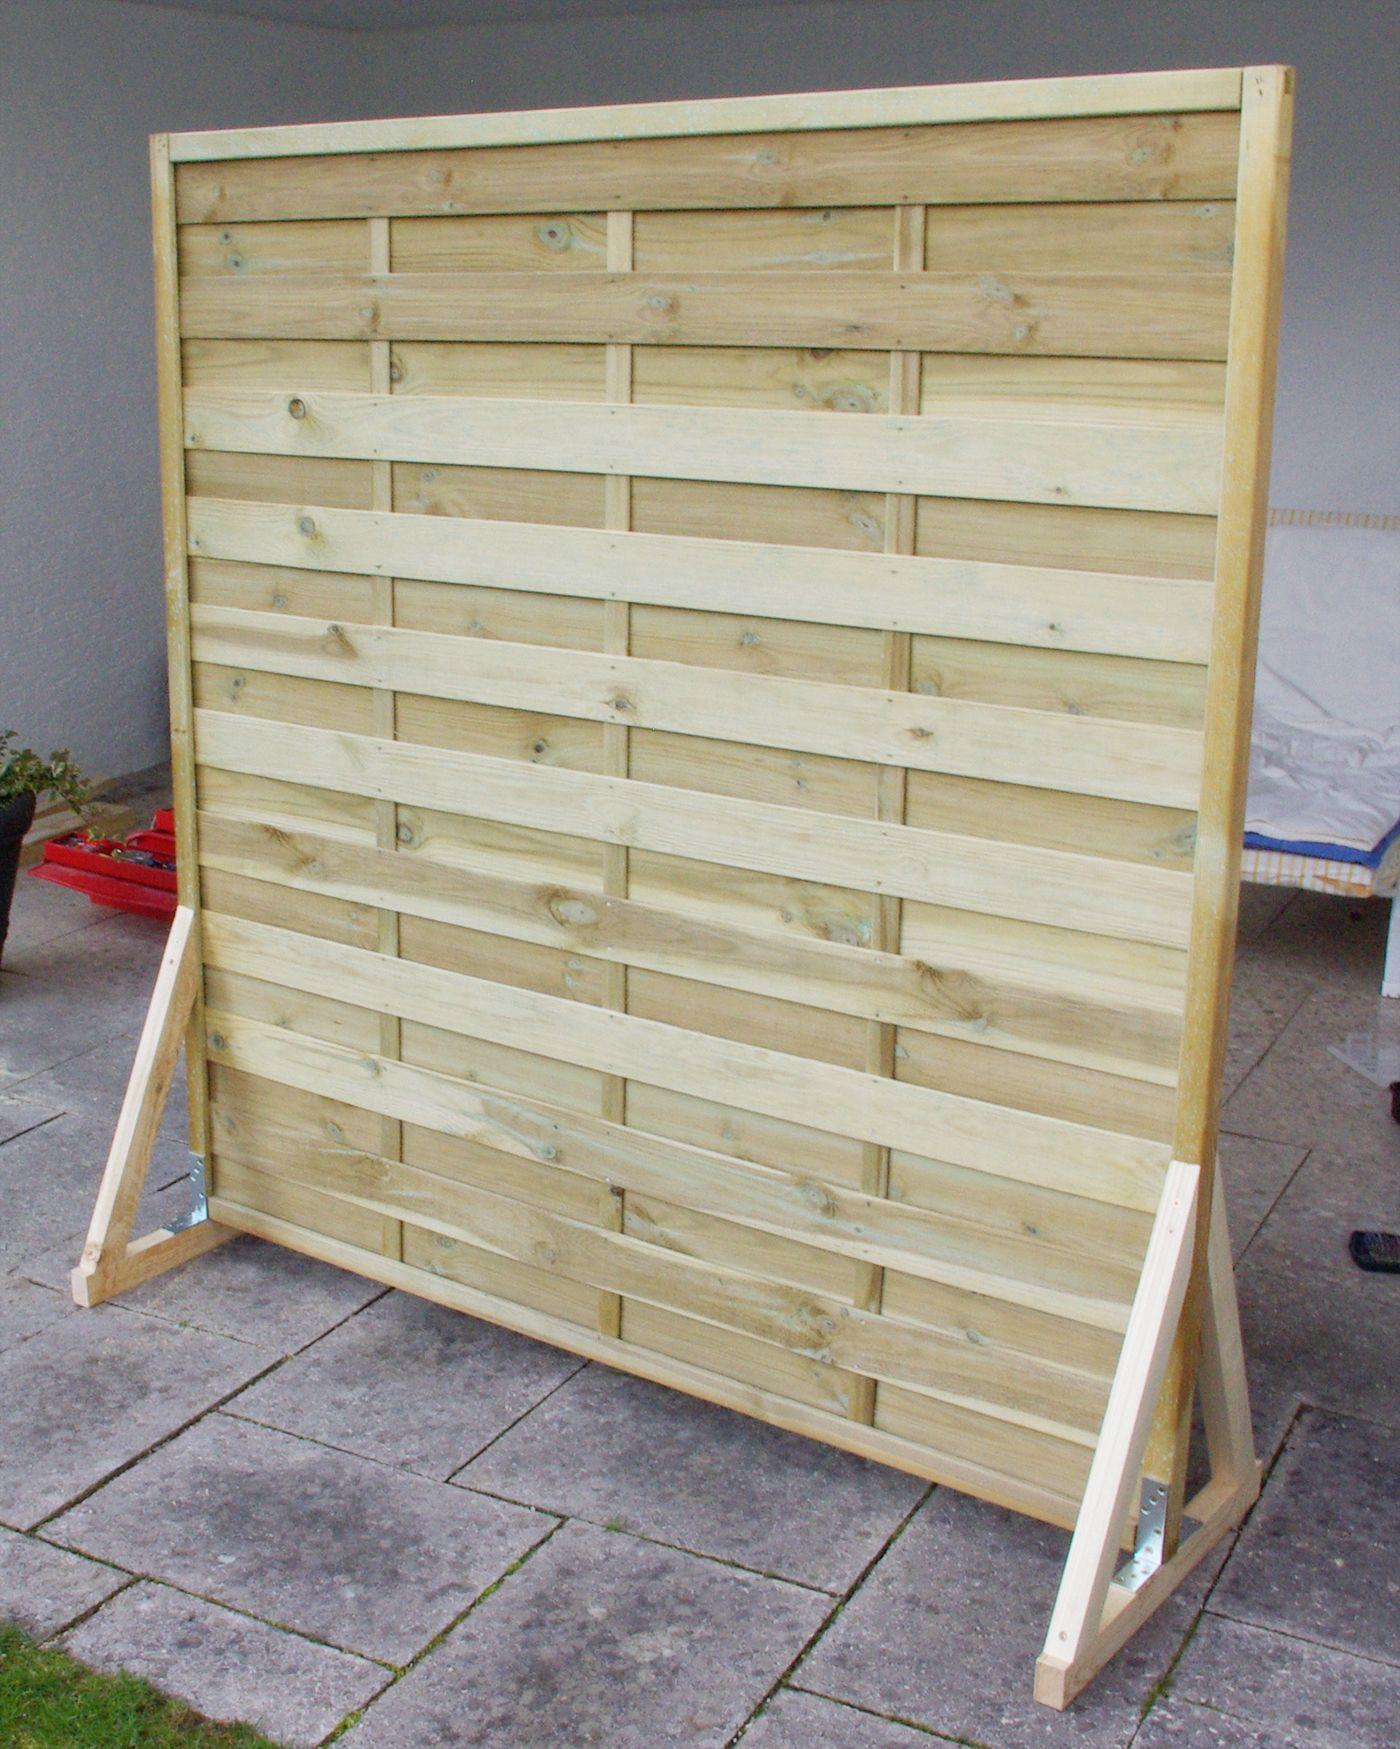 Sichtschutz Paravent Garten Balkon selber bauen Anleitung DIY